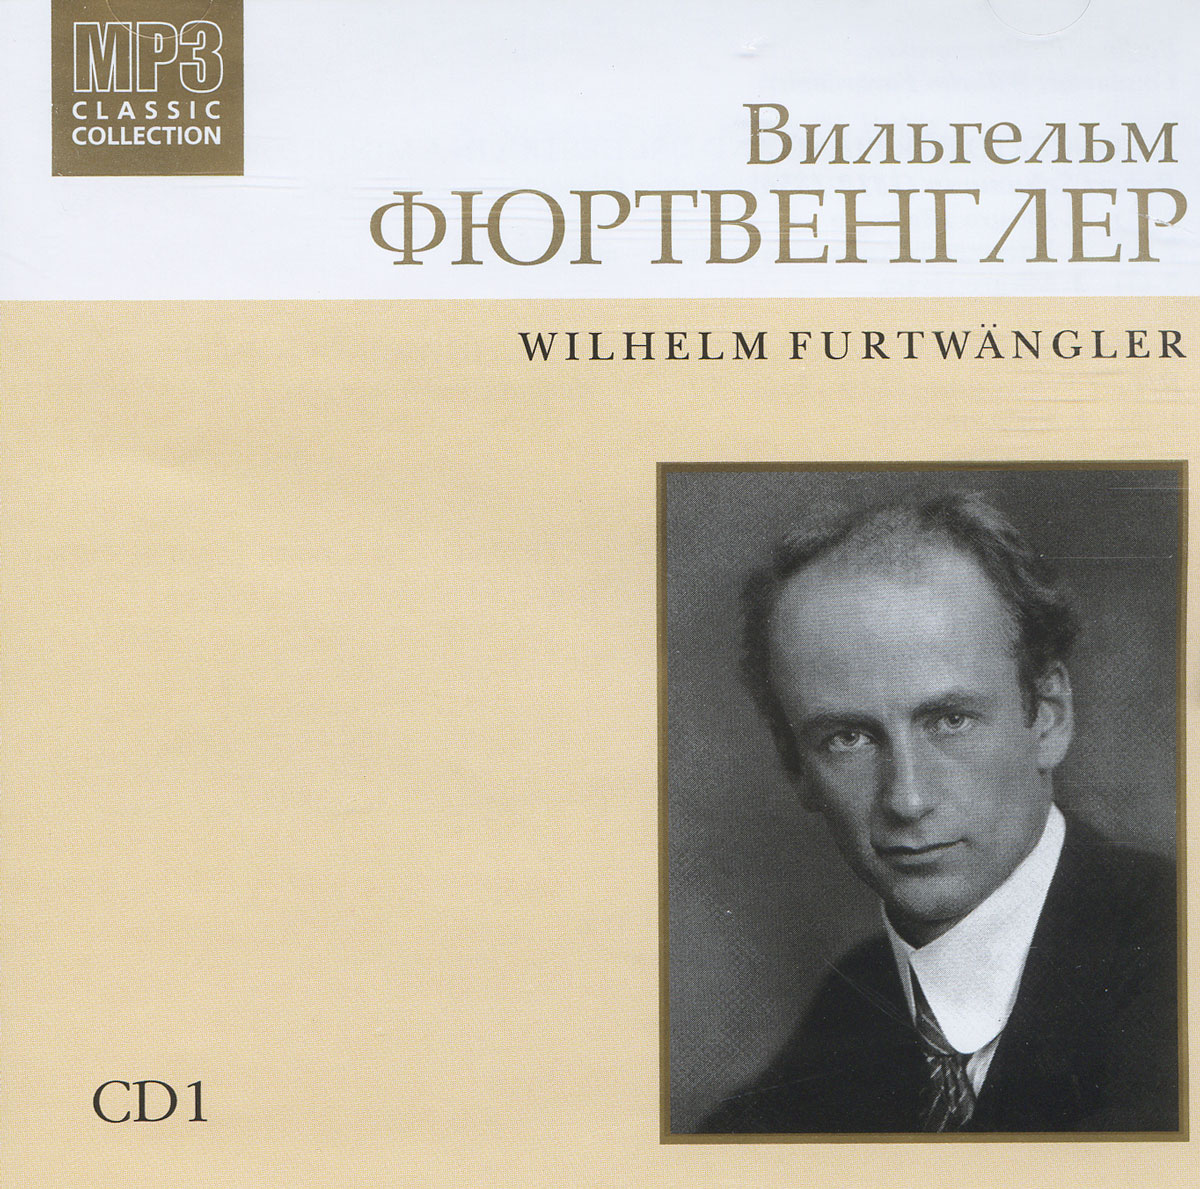 Вильгельм Фуртвенглер,Berliner Philharmoniker Вильгельм Фюртвенглер. CD 1 (mp3) münchner philharmoniker elbphilharmonie hamburg